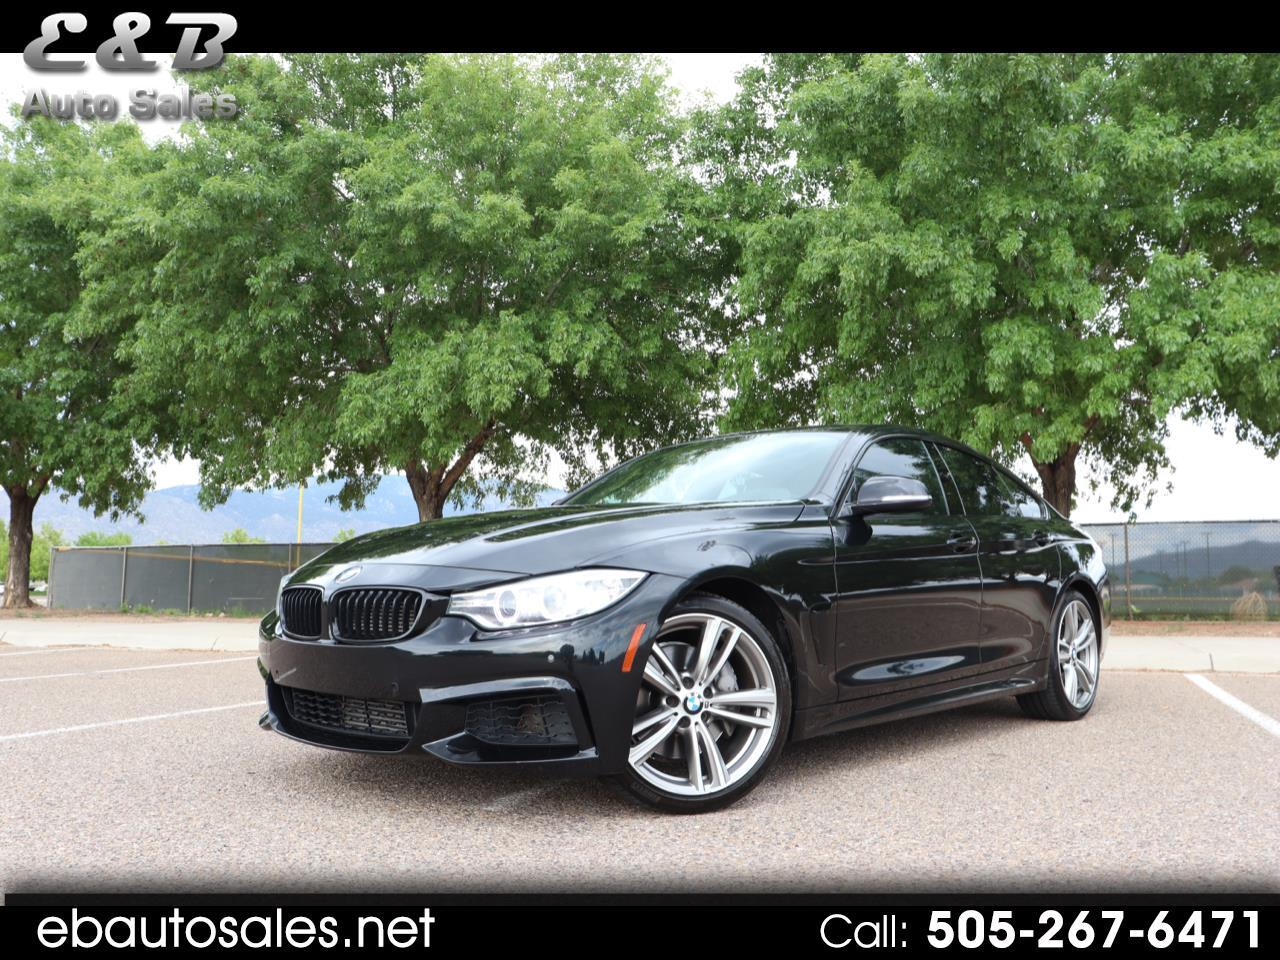 BMW 4-Series Gran Coupe 435i 2015